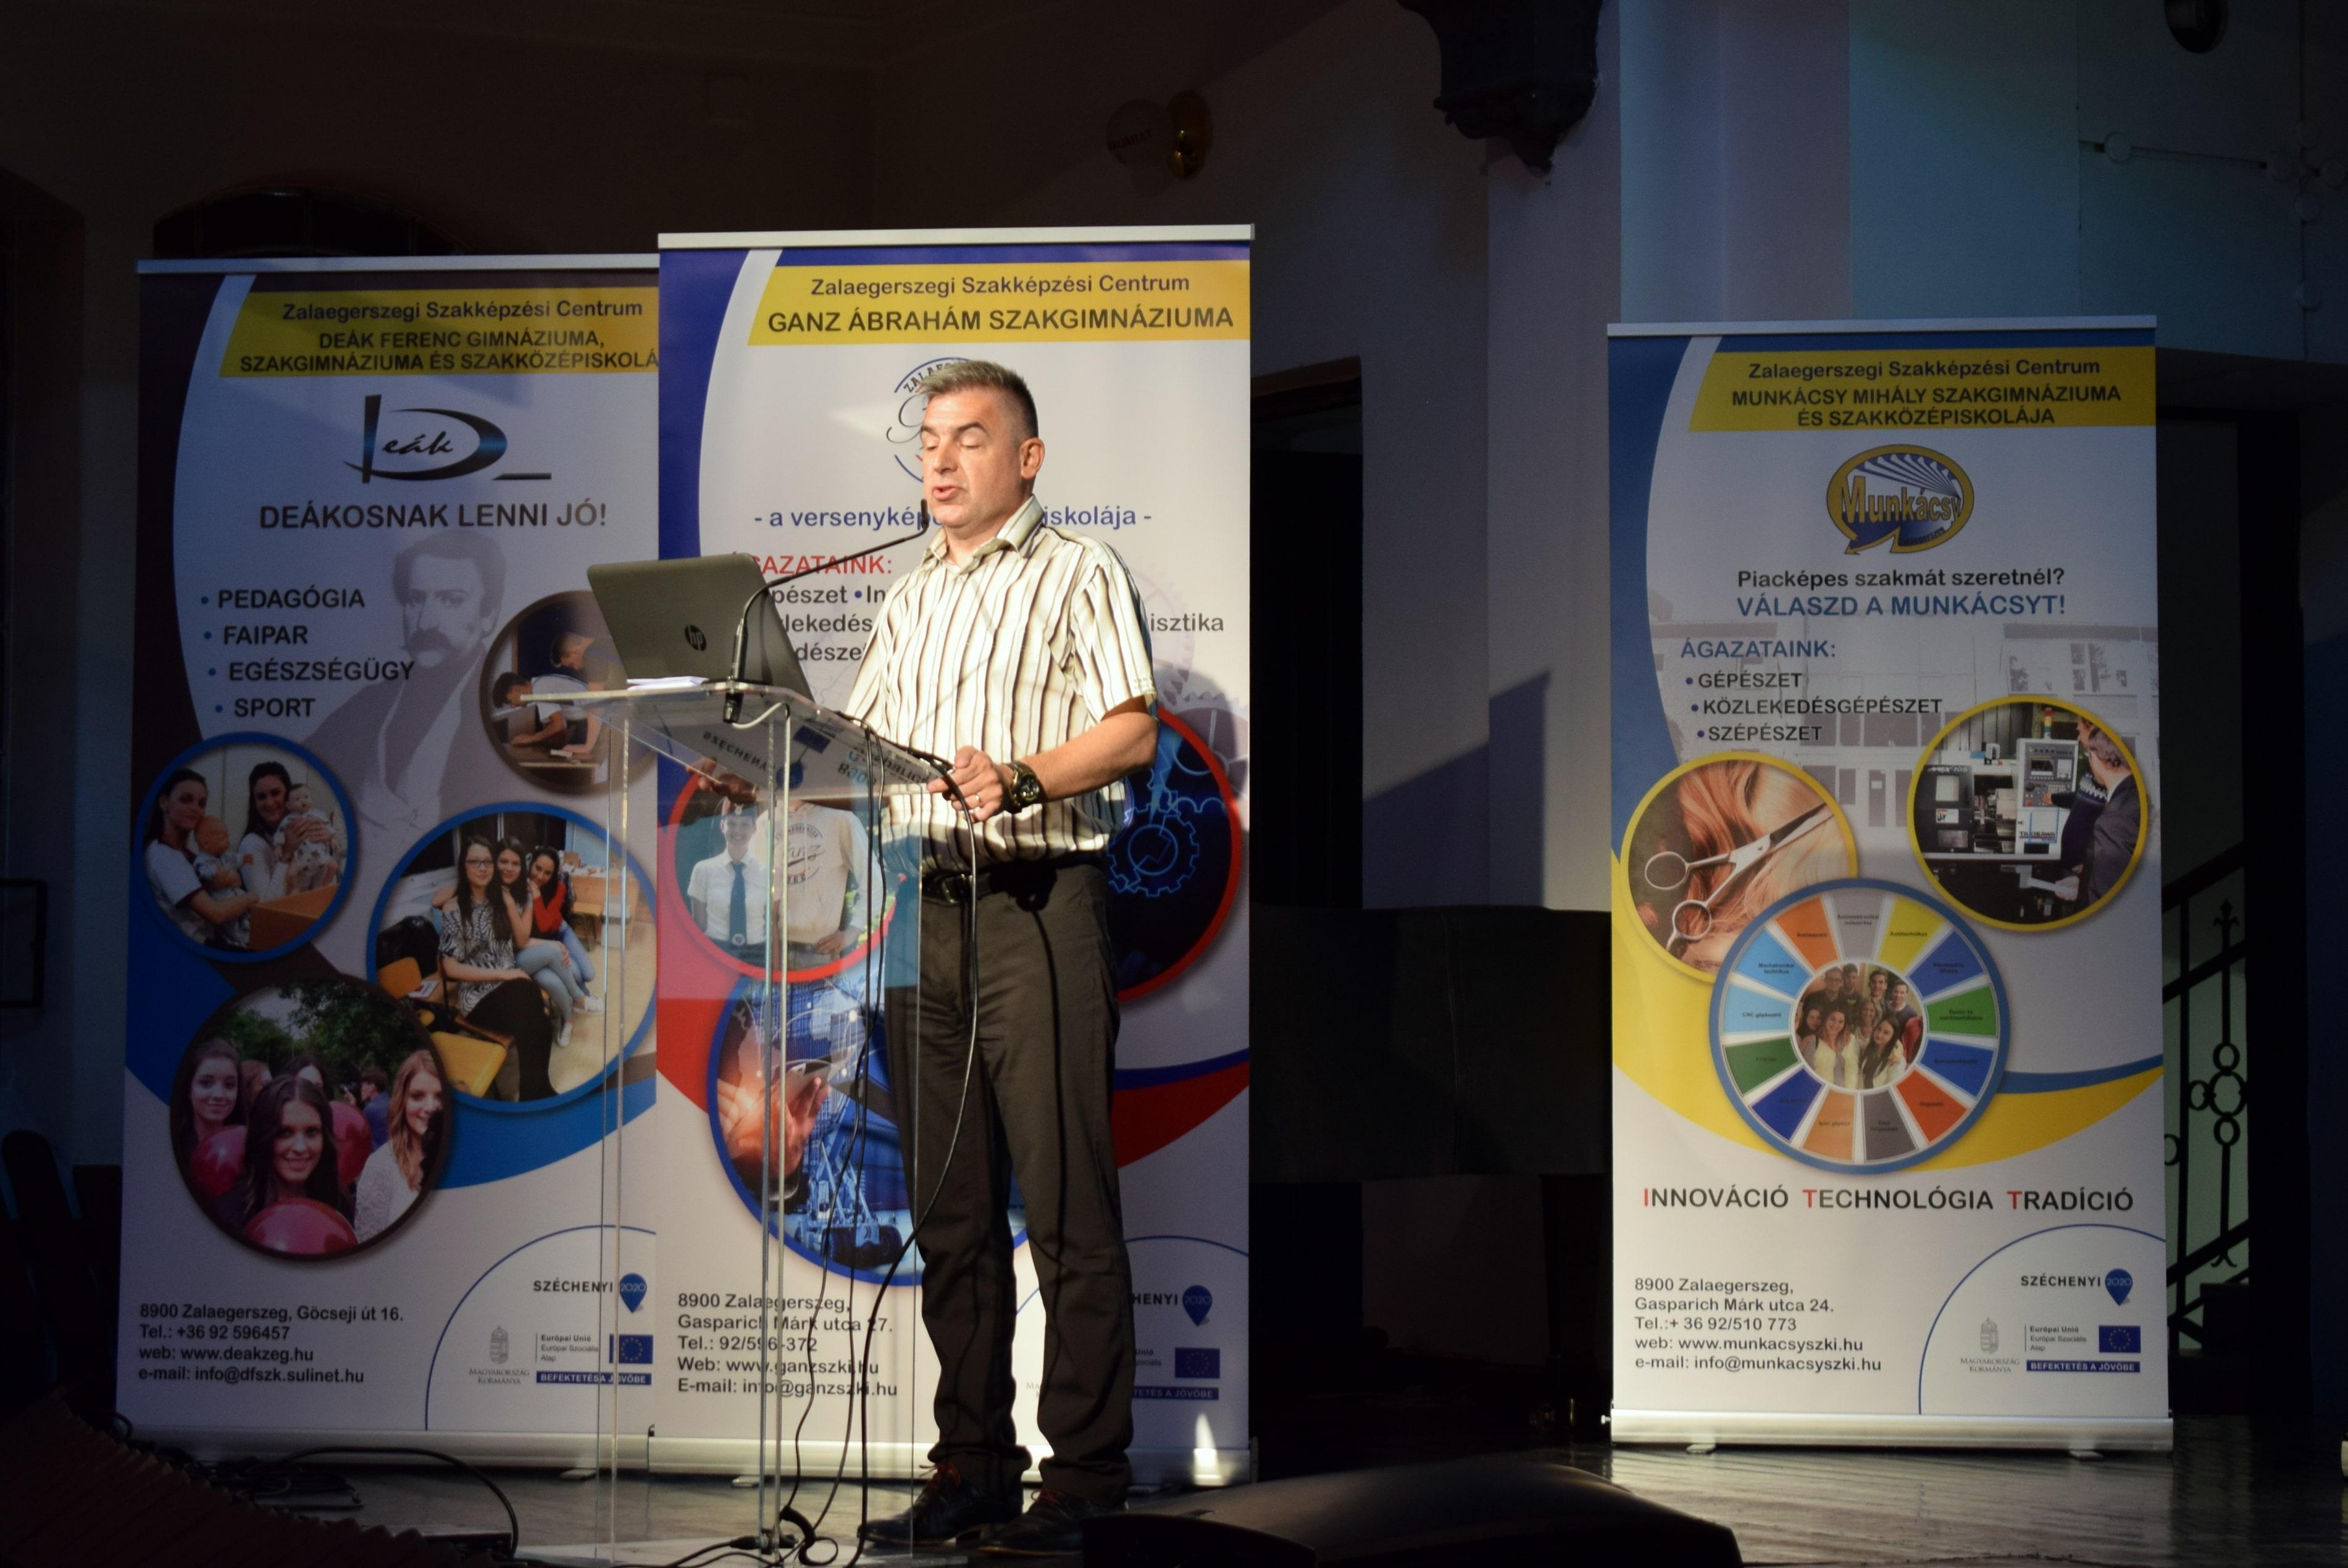 RP2_Closing_Conference_Zalaegerszeg_012_2019_06_05-min